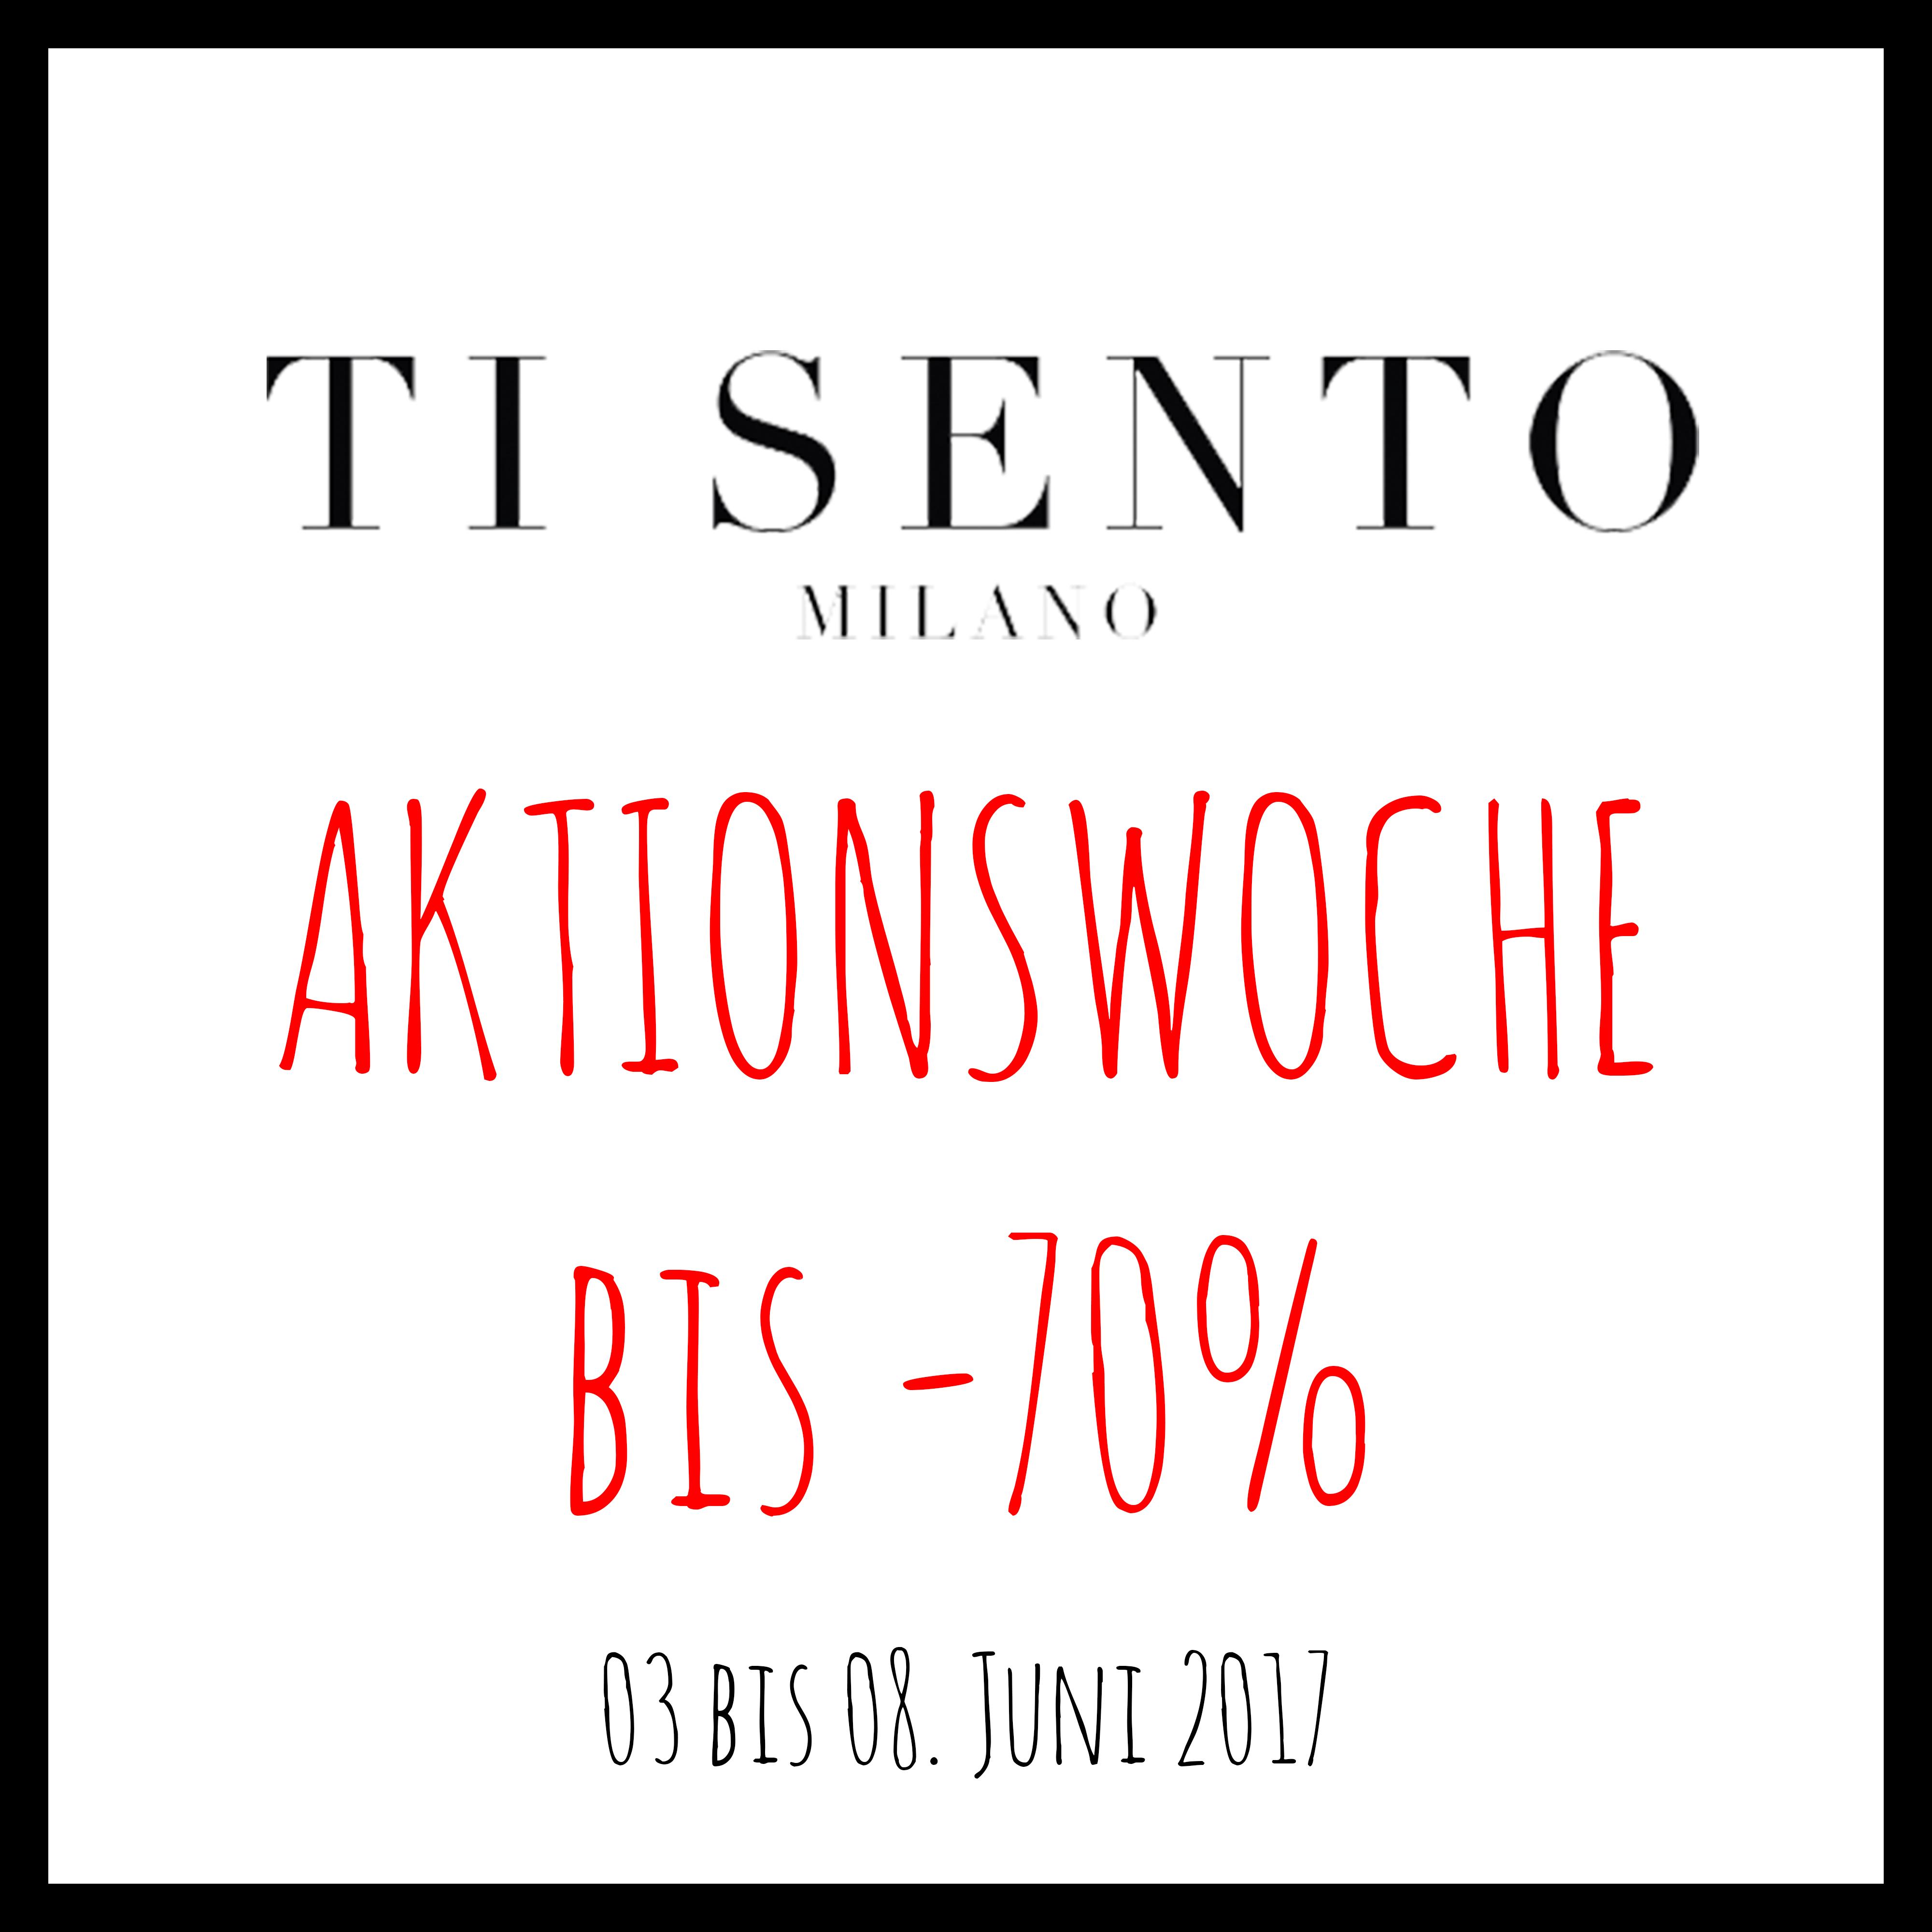 Aktionswoche_TiSento